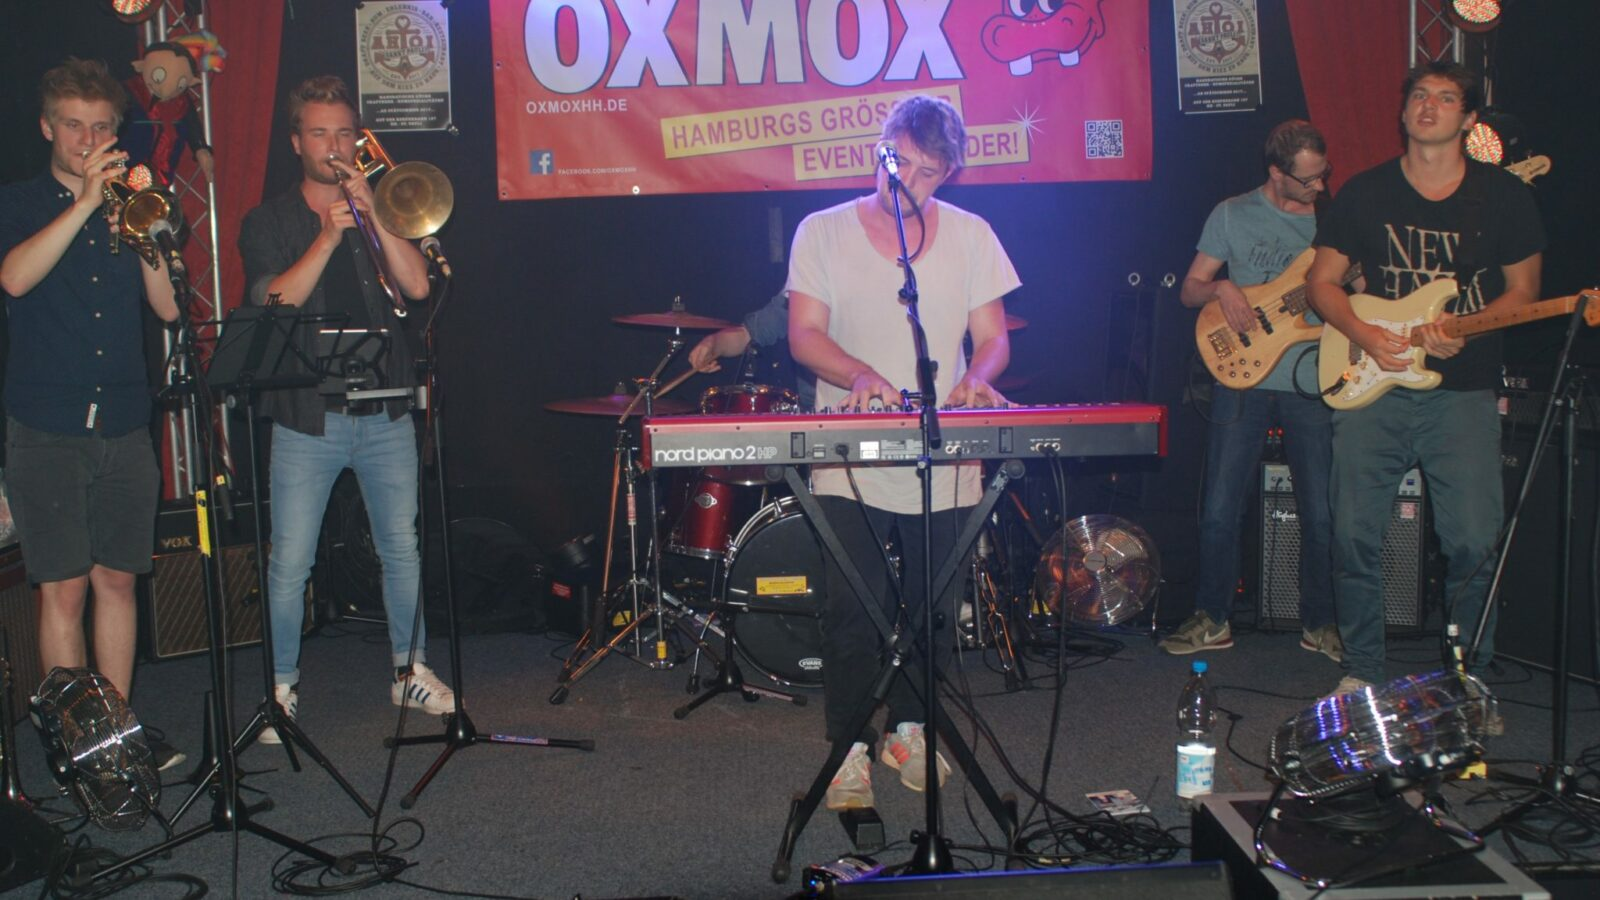 OXMOX PRESENTS: EXKL. FOTOS DES 32. HAMBURG-BANDCONTEST HALBFINALES (06.07.17) – Schmidt – Pop aus Hamburg